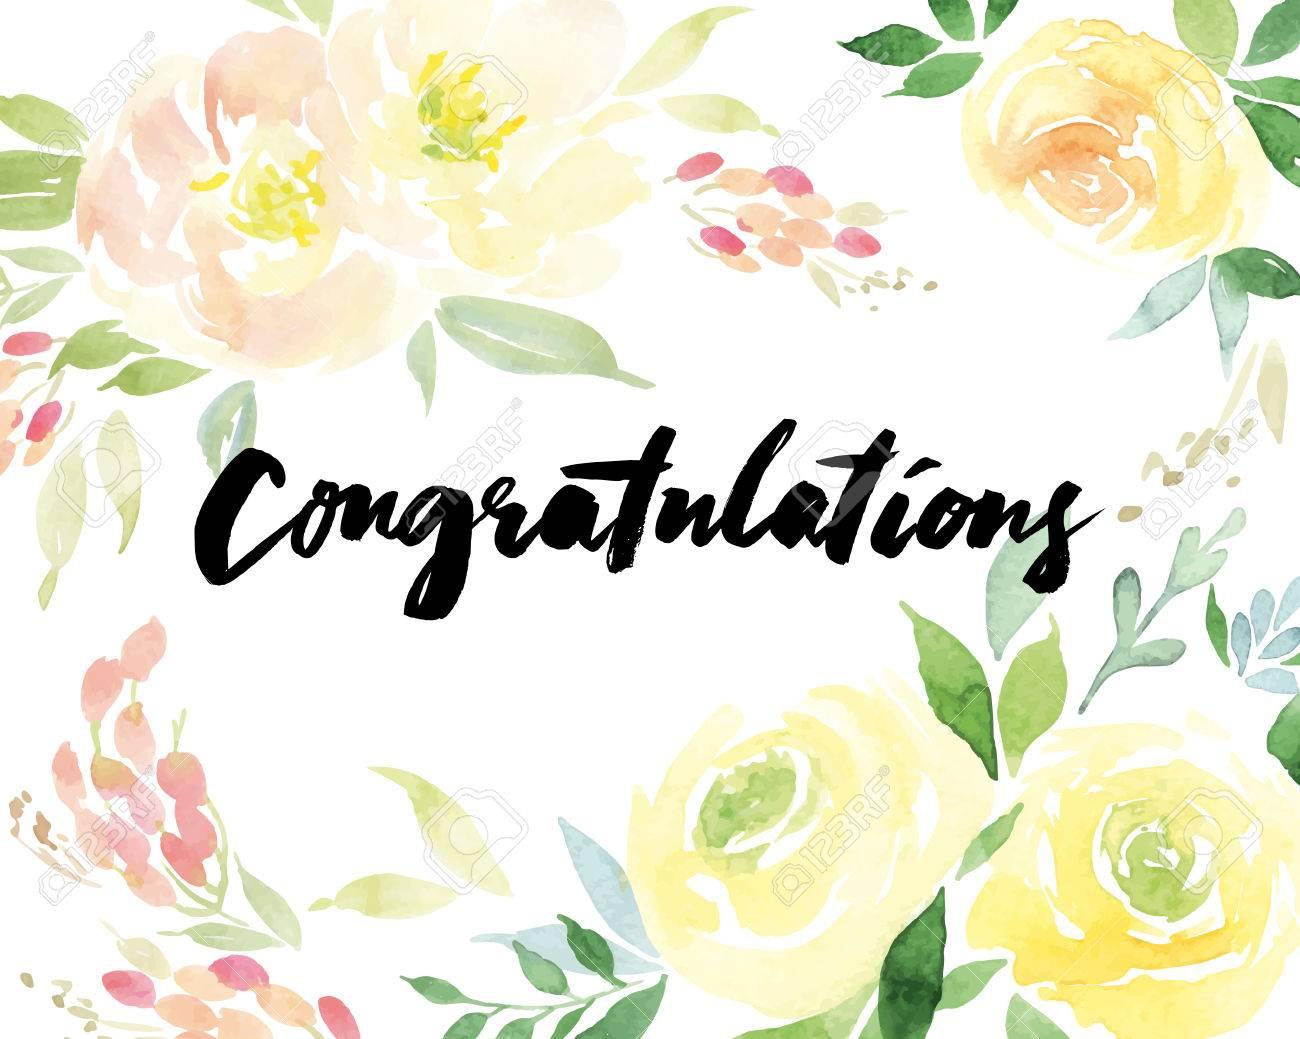 Watercolor greeting card flowers. Handmade. Congratulations. - 40045119